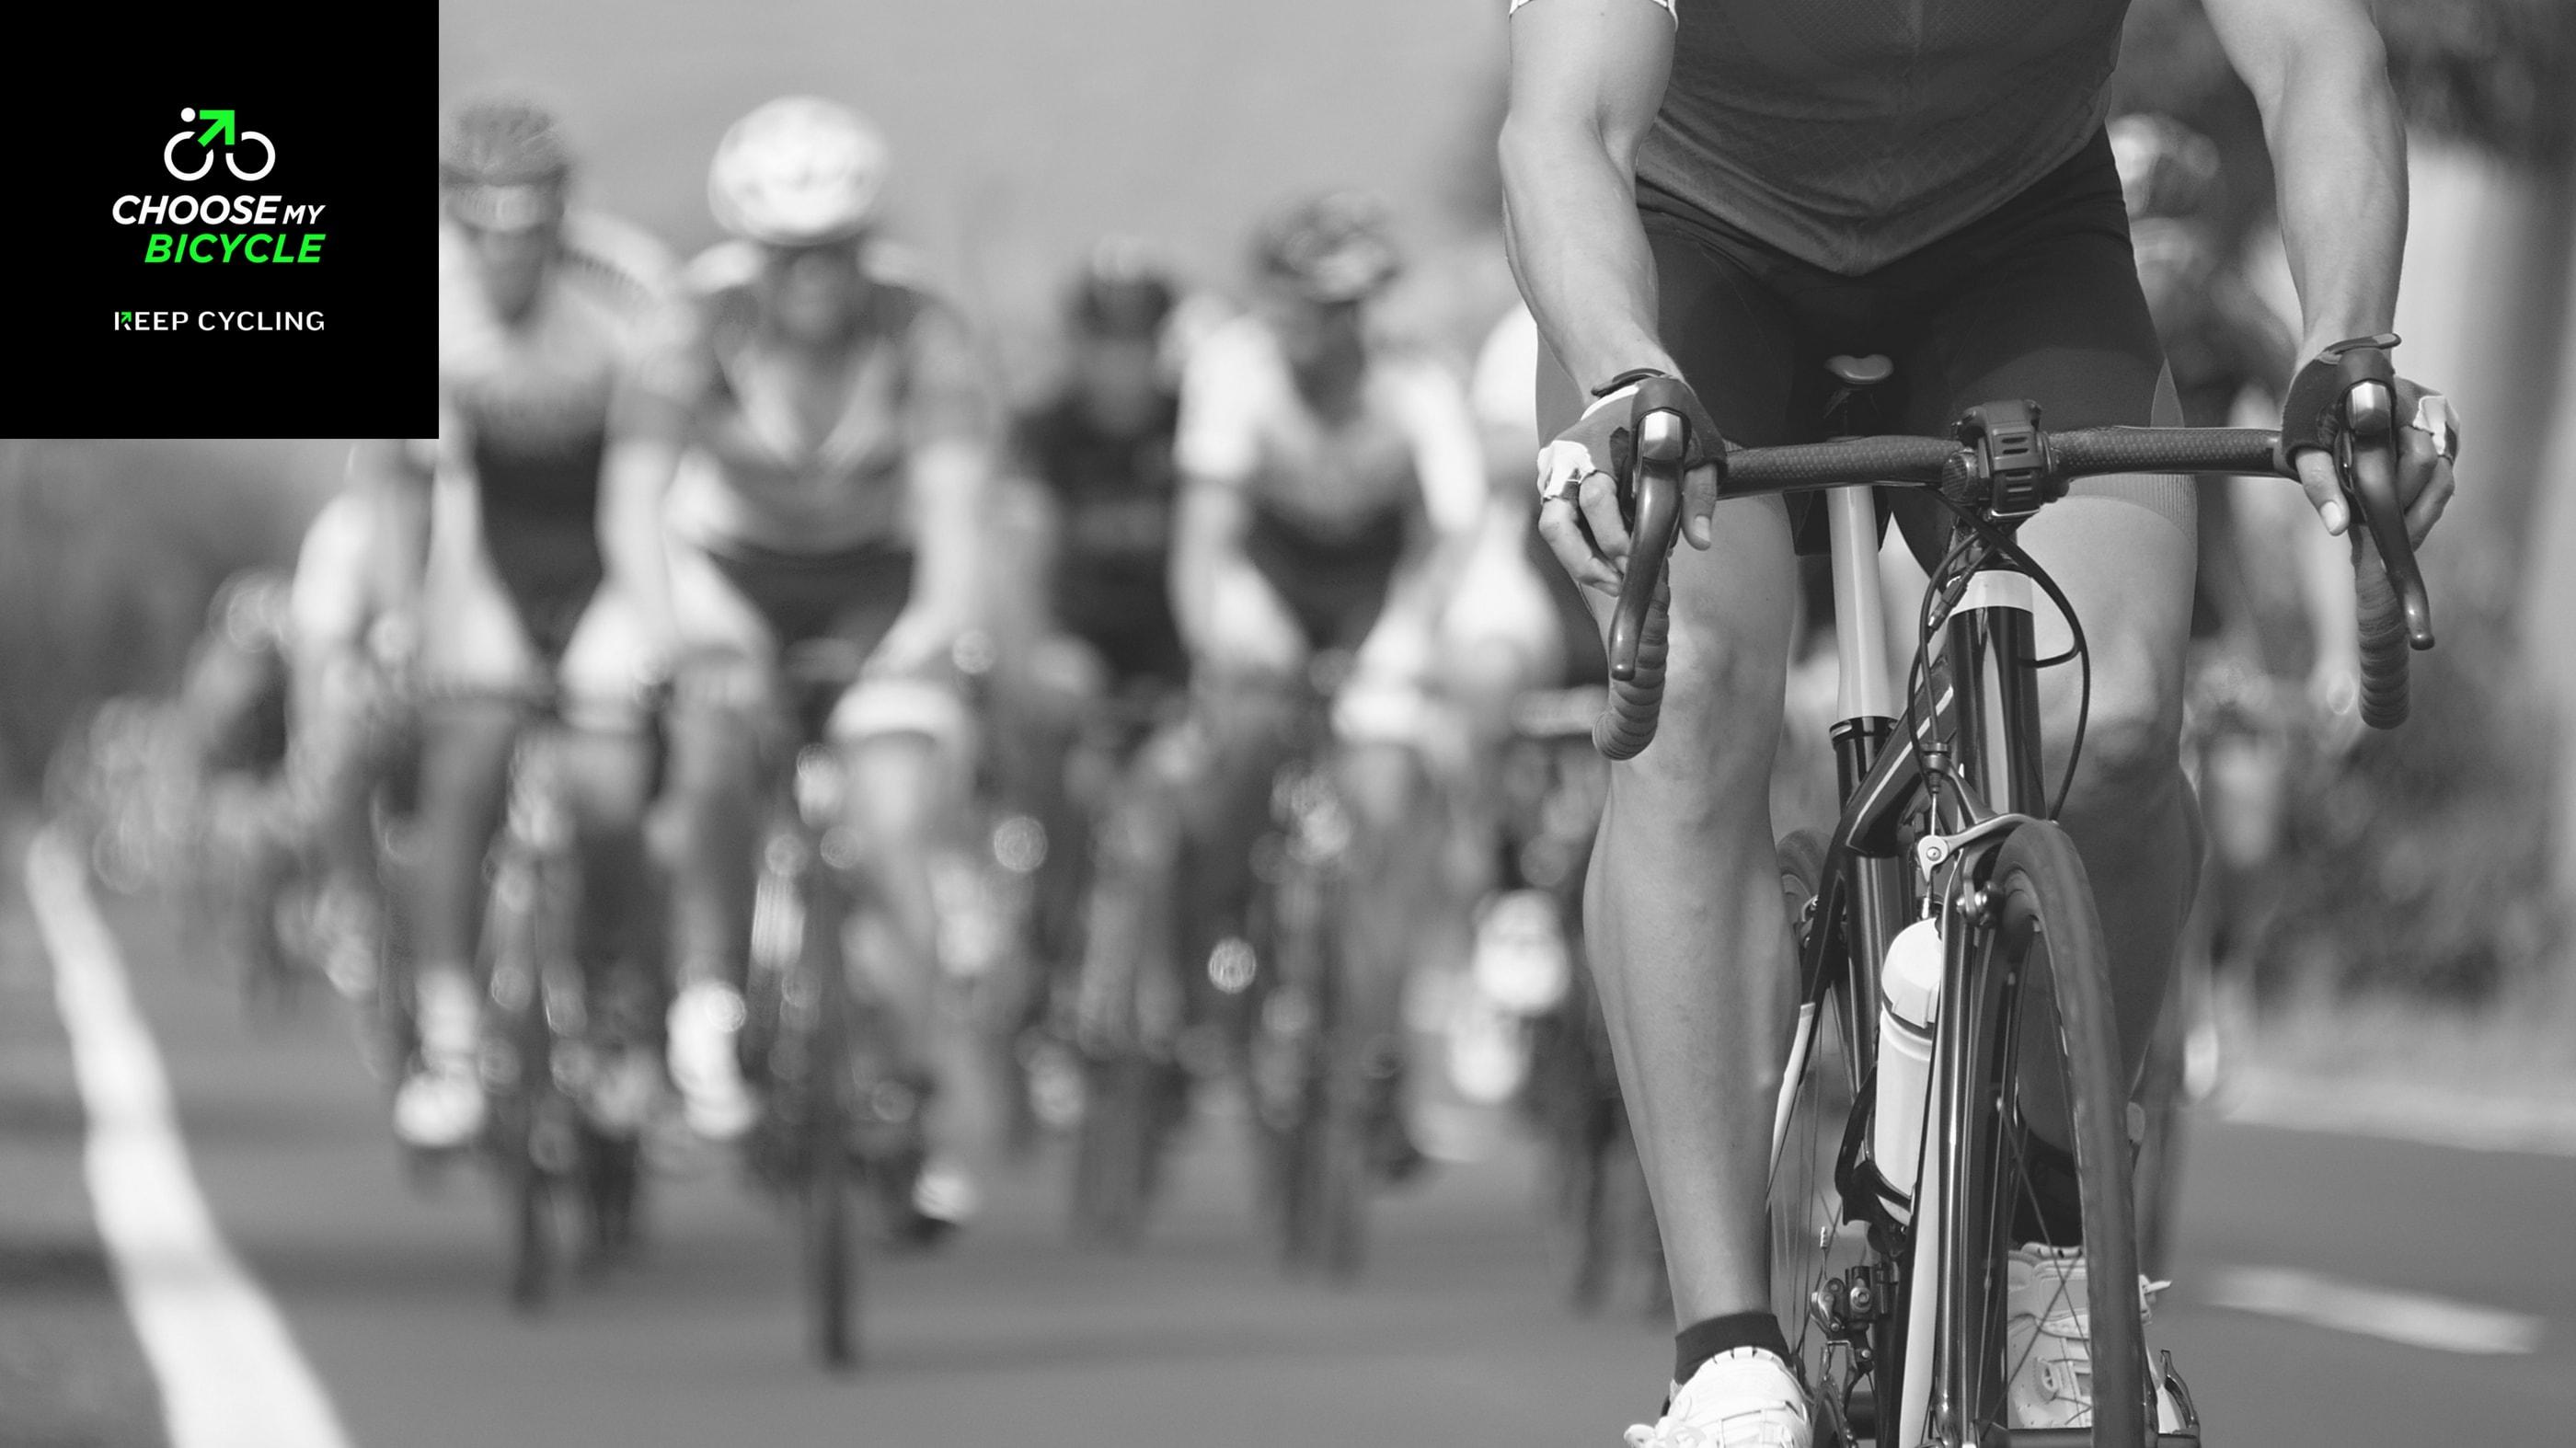 ChooseMyBicycle.com Keep Cycling Challenge